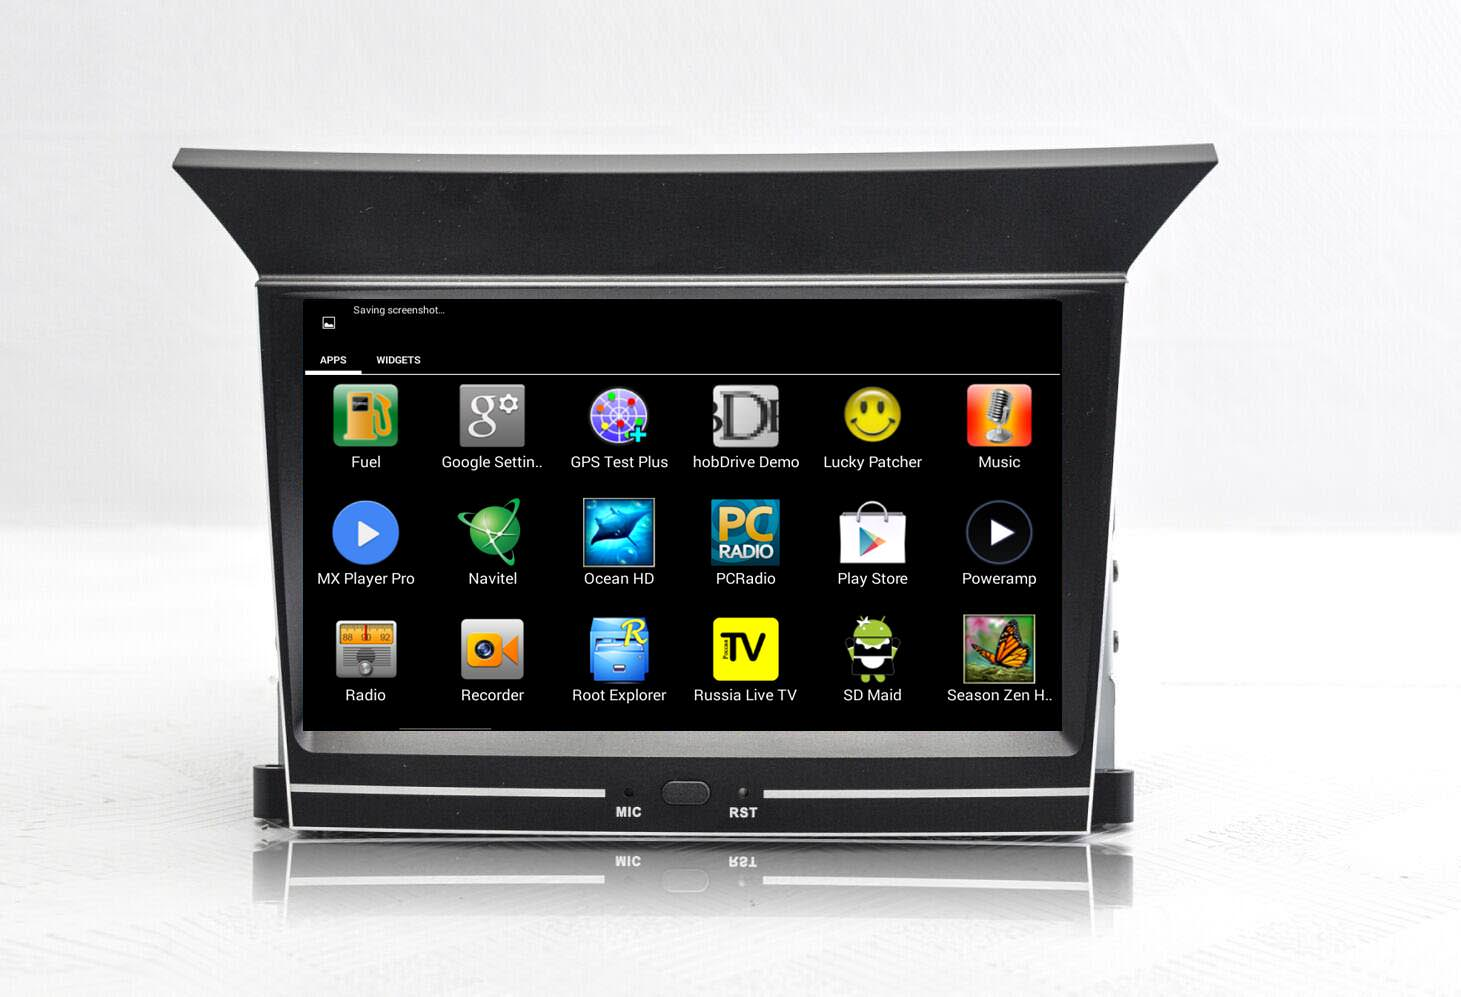 Штатная магнитола CARMEDIA DABT-3706 DVD Honda Pilot 2008-2015 штатная магнитола carmedia dabt 3706 dvd honda pilot 2008 2015